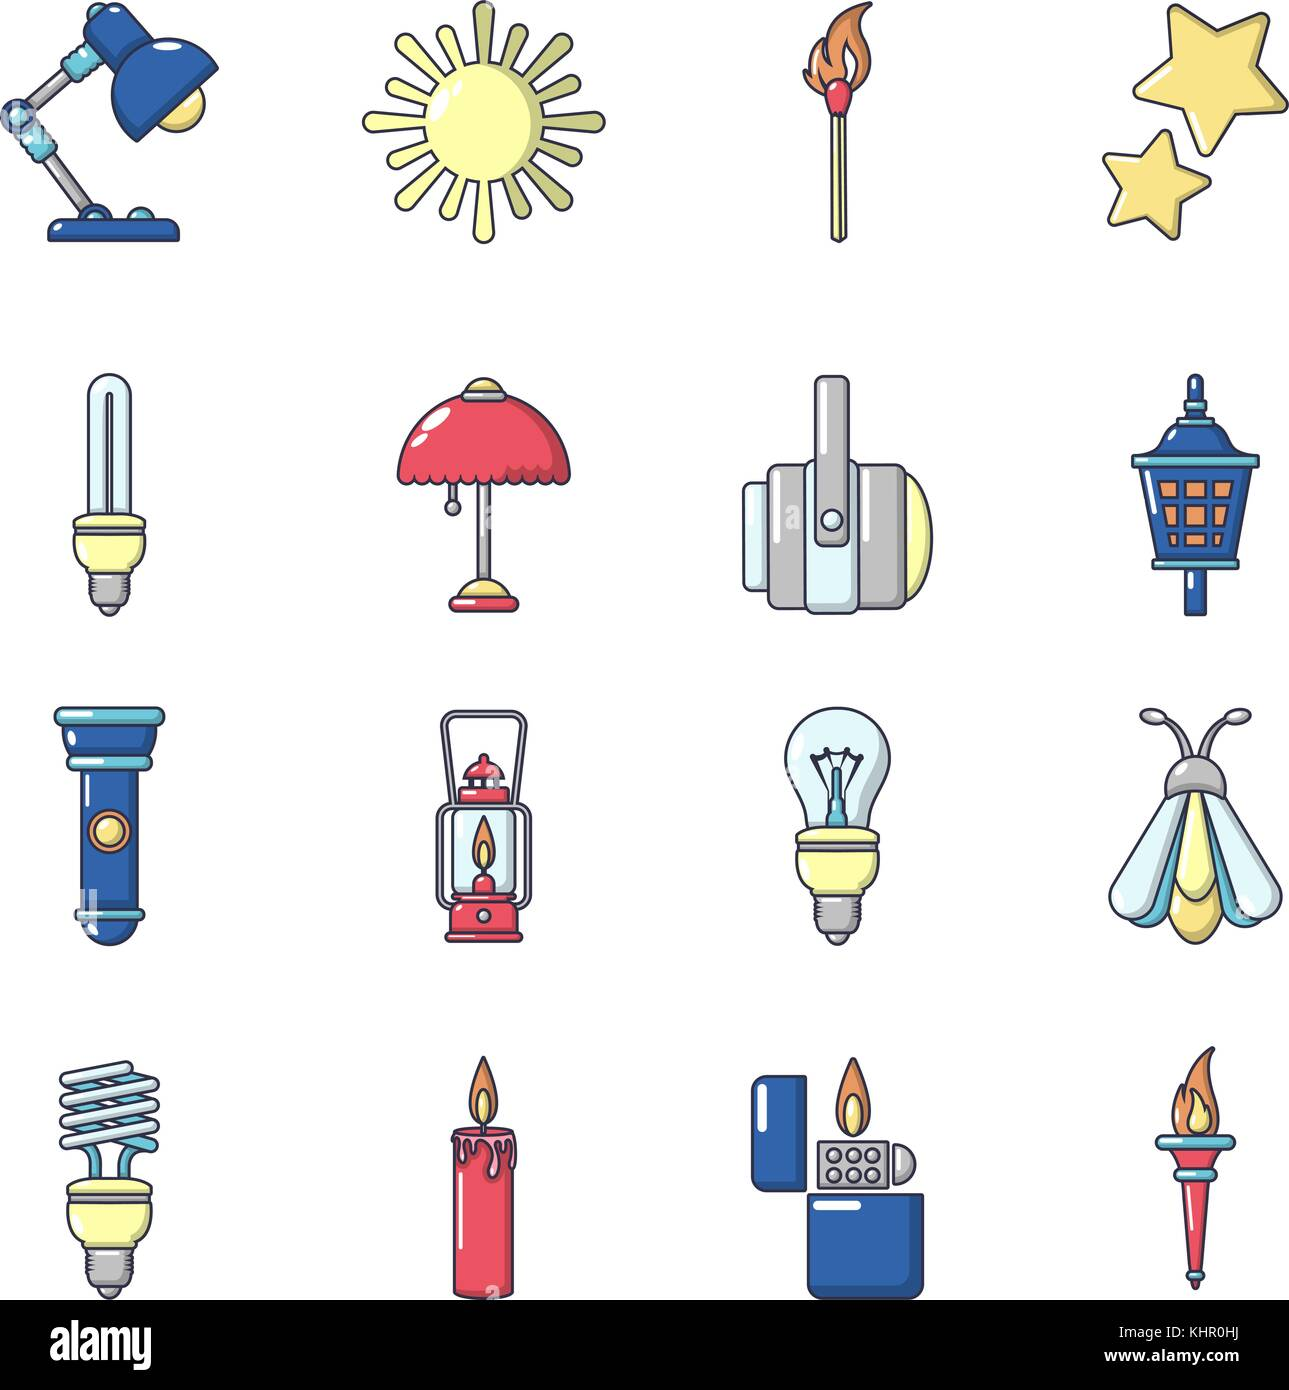 Cartoon Illustration Power Light Switch Stock Photos